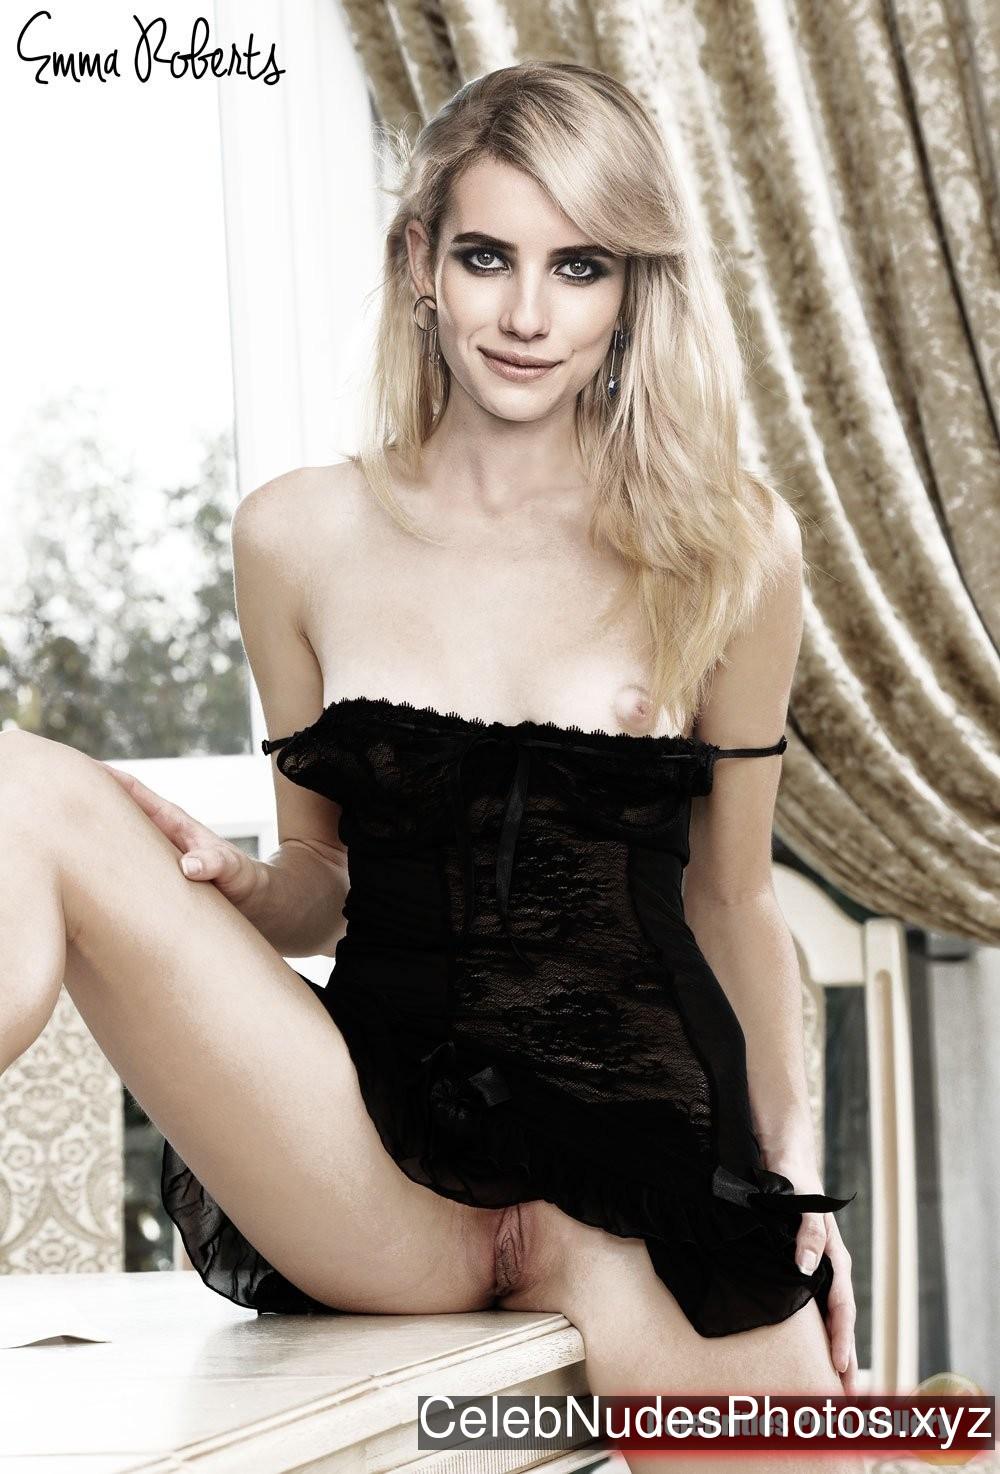 Emma Roberts Nude Celeb sexy 2